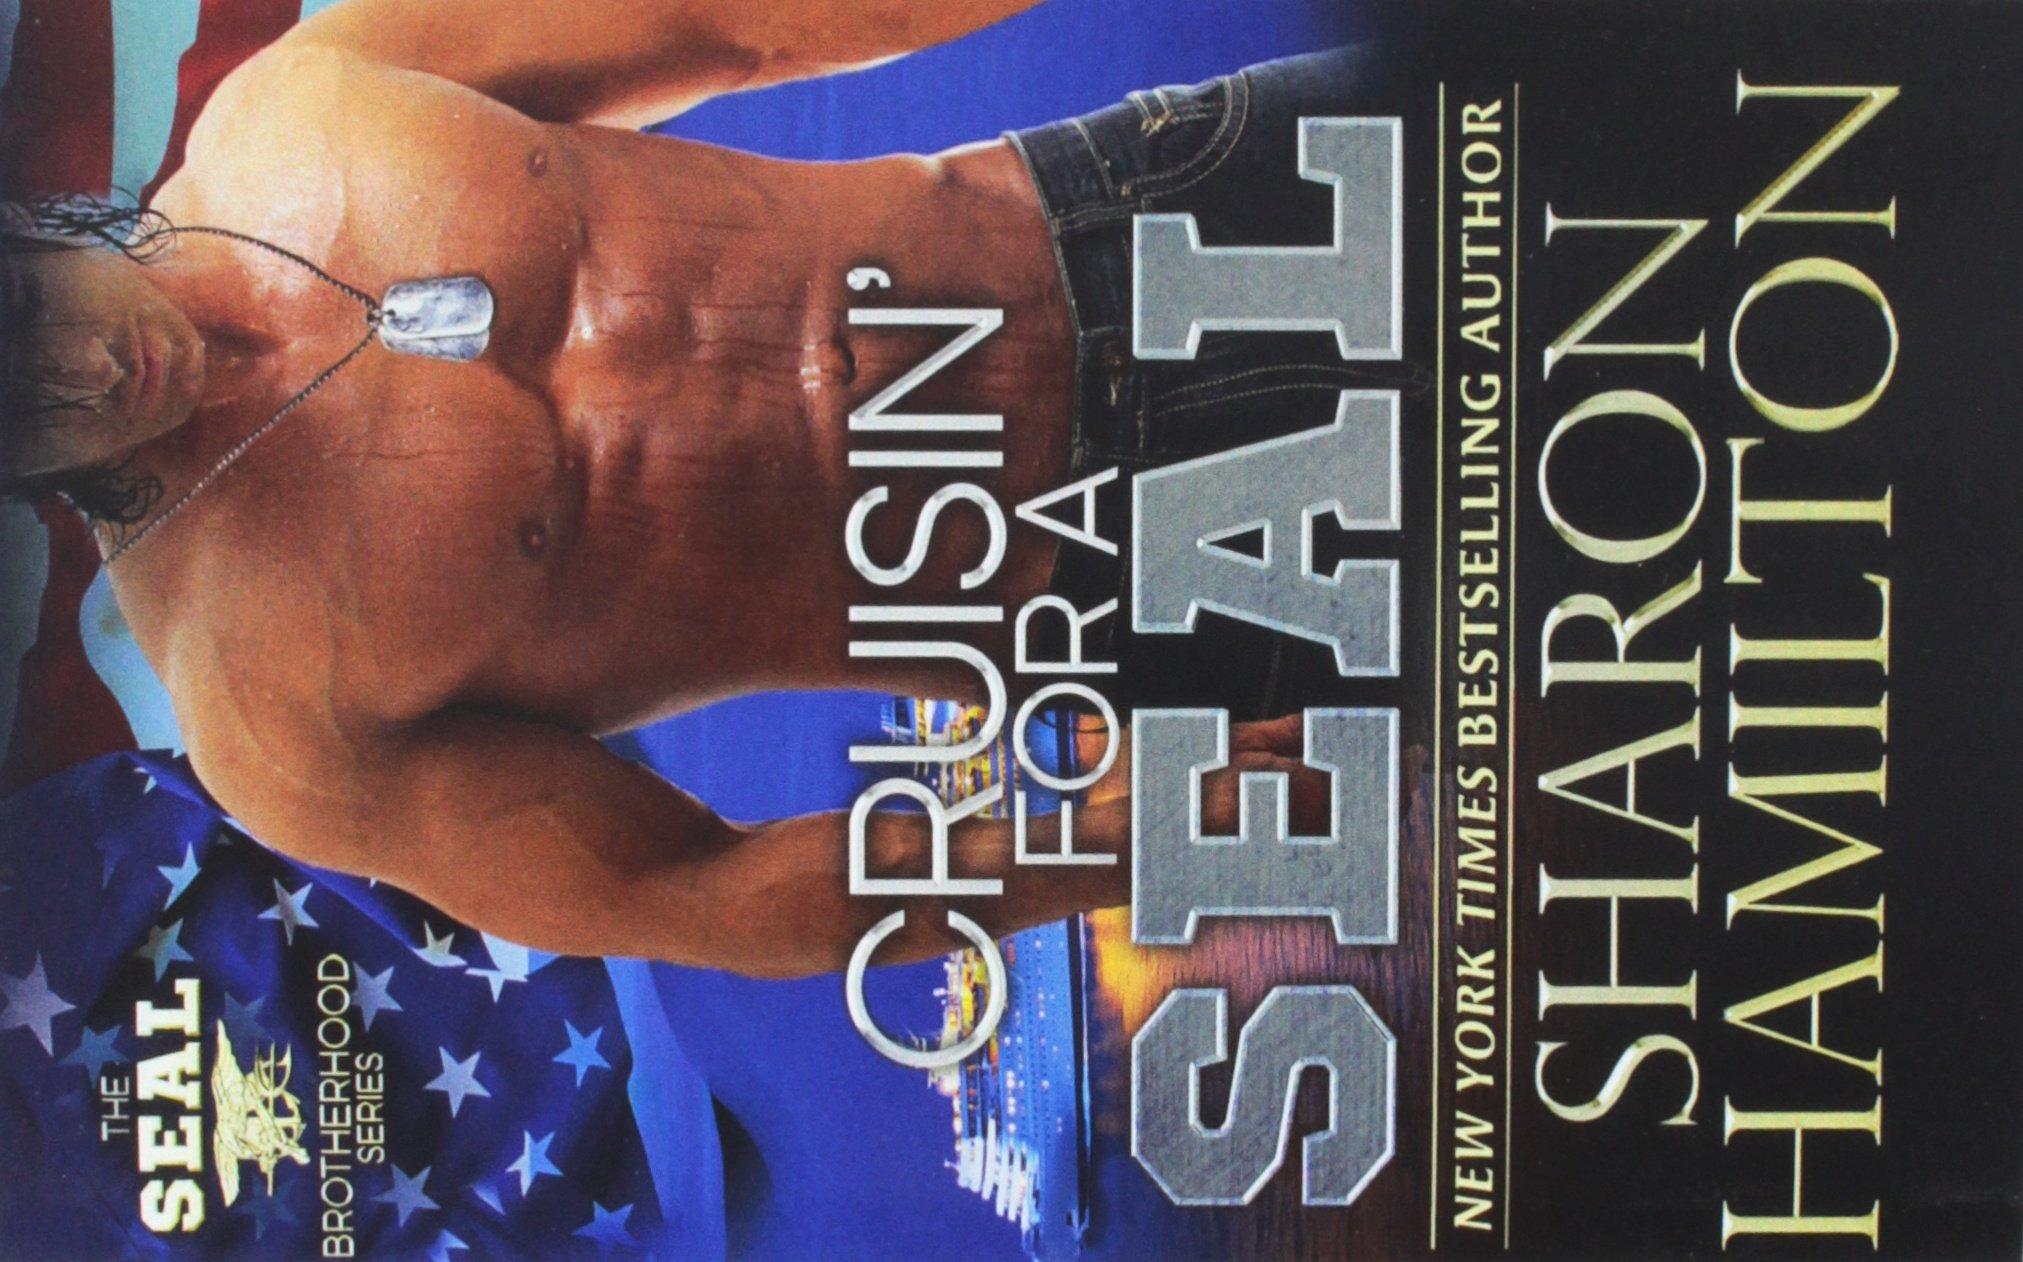 Cruisin' For A SEAL: SEAL Brotherhood #5 (Volume 5) ebook